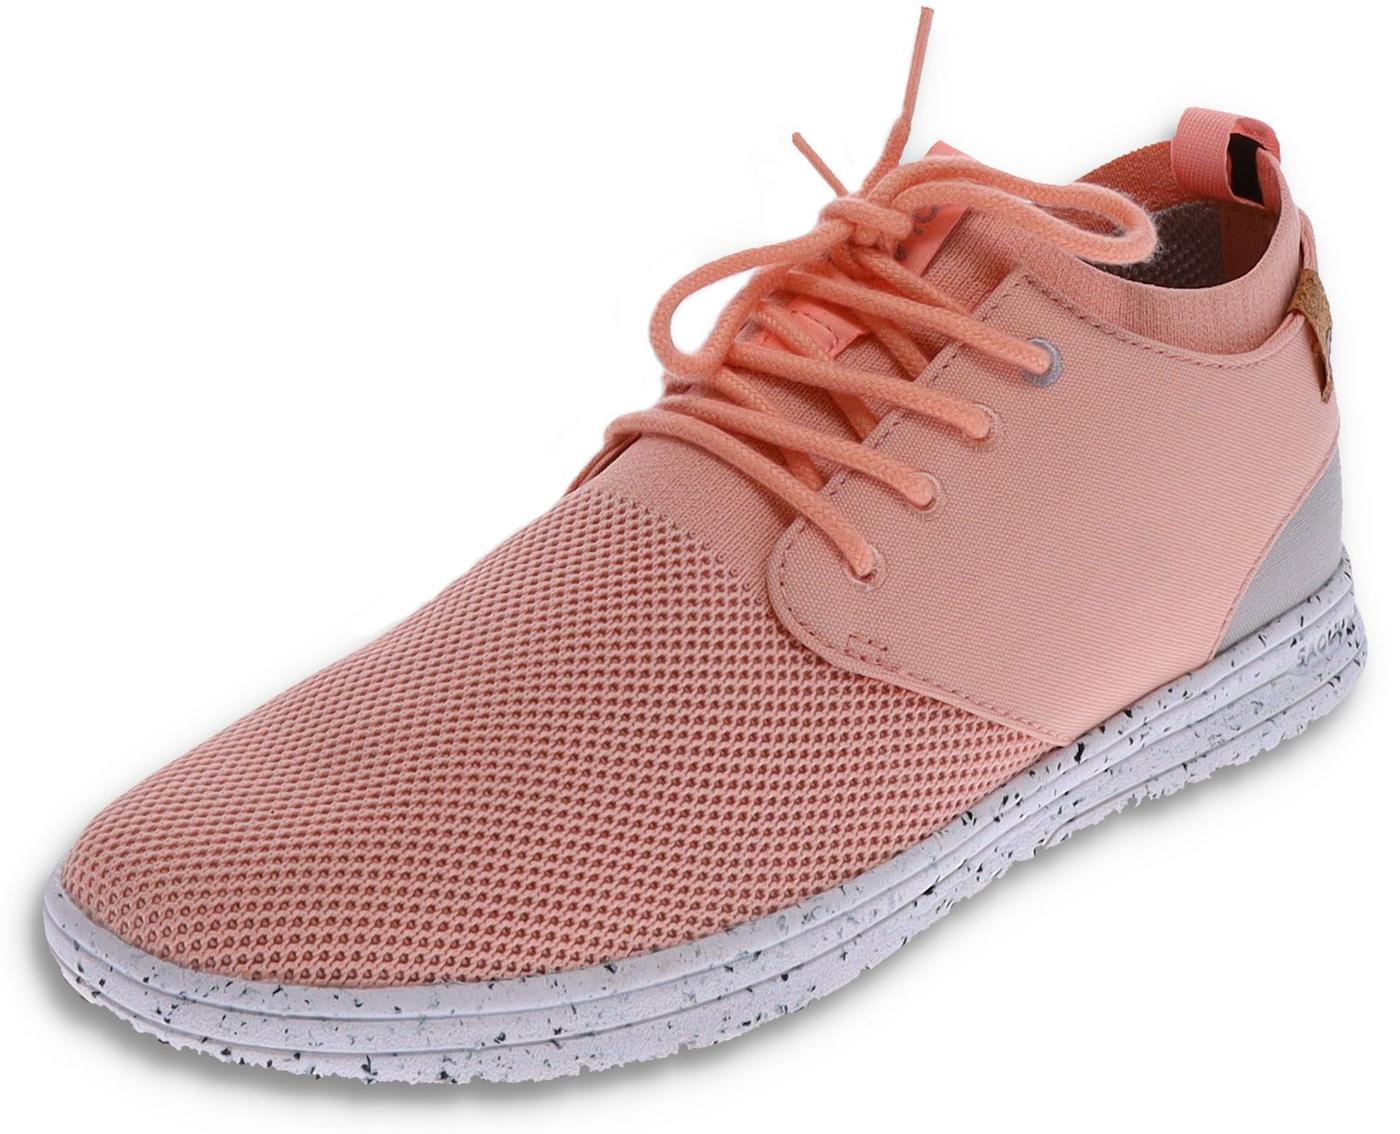 Saola SEMNOZ II Rose Gold vegan ladies sneaker - pink